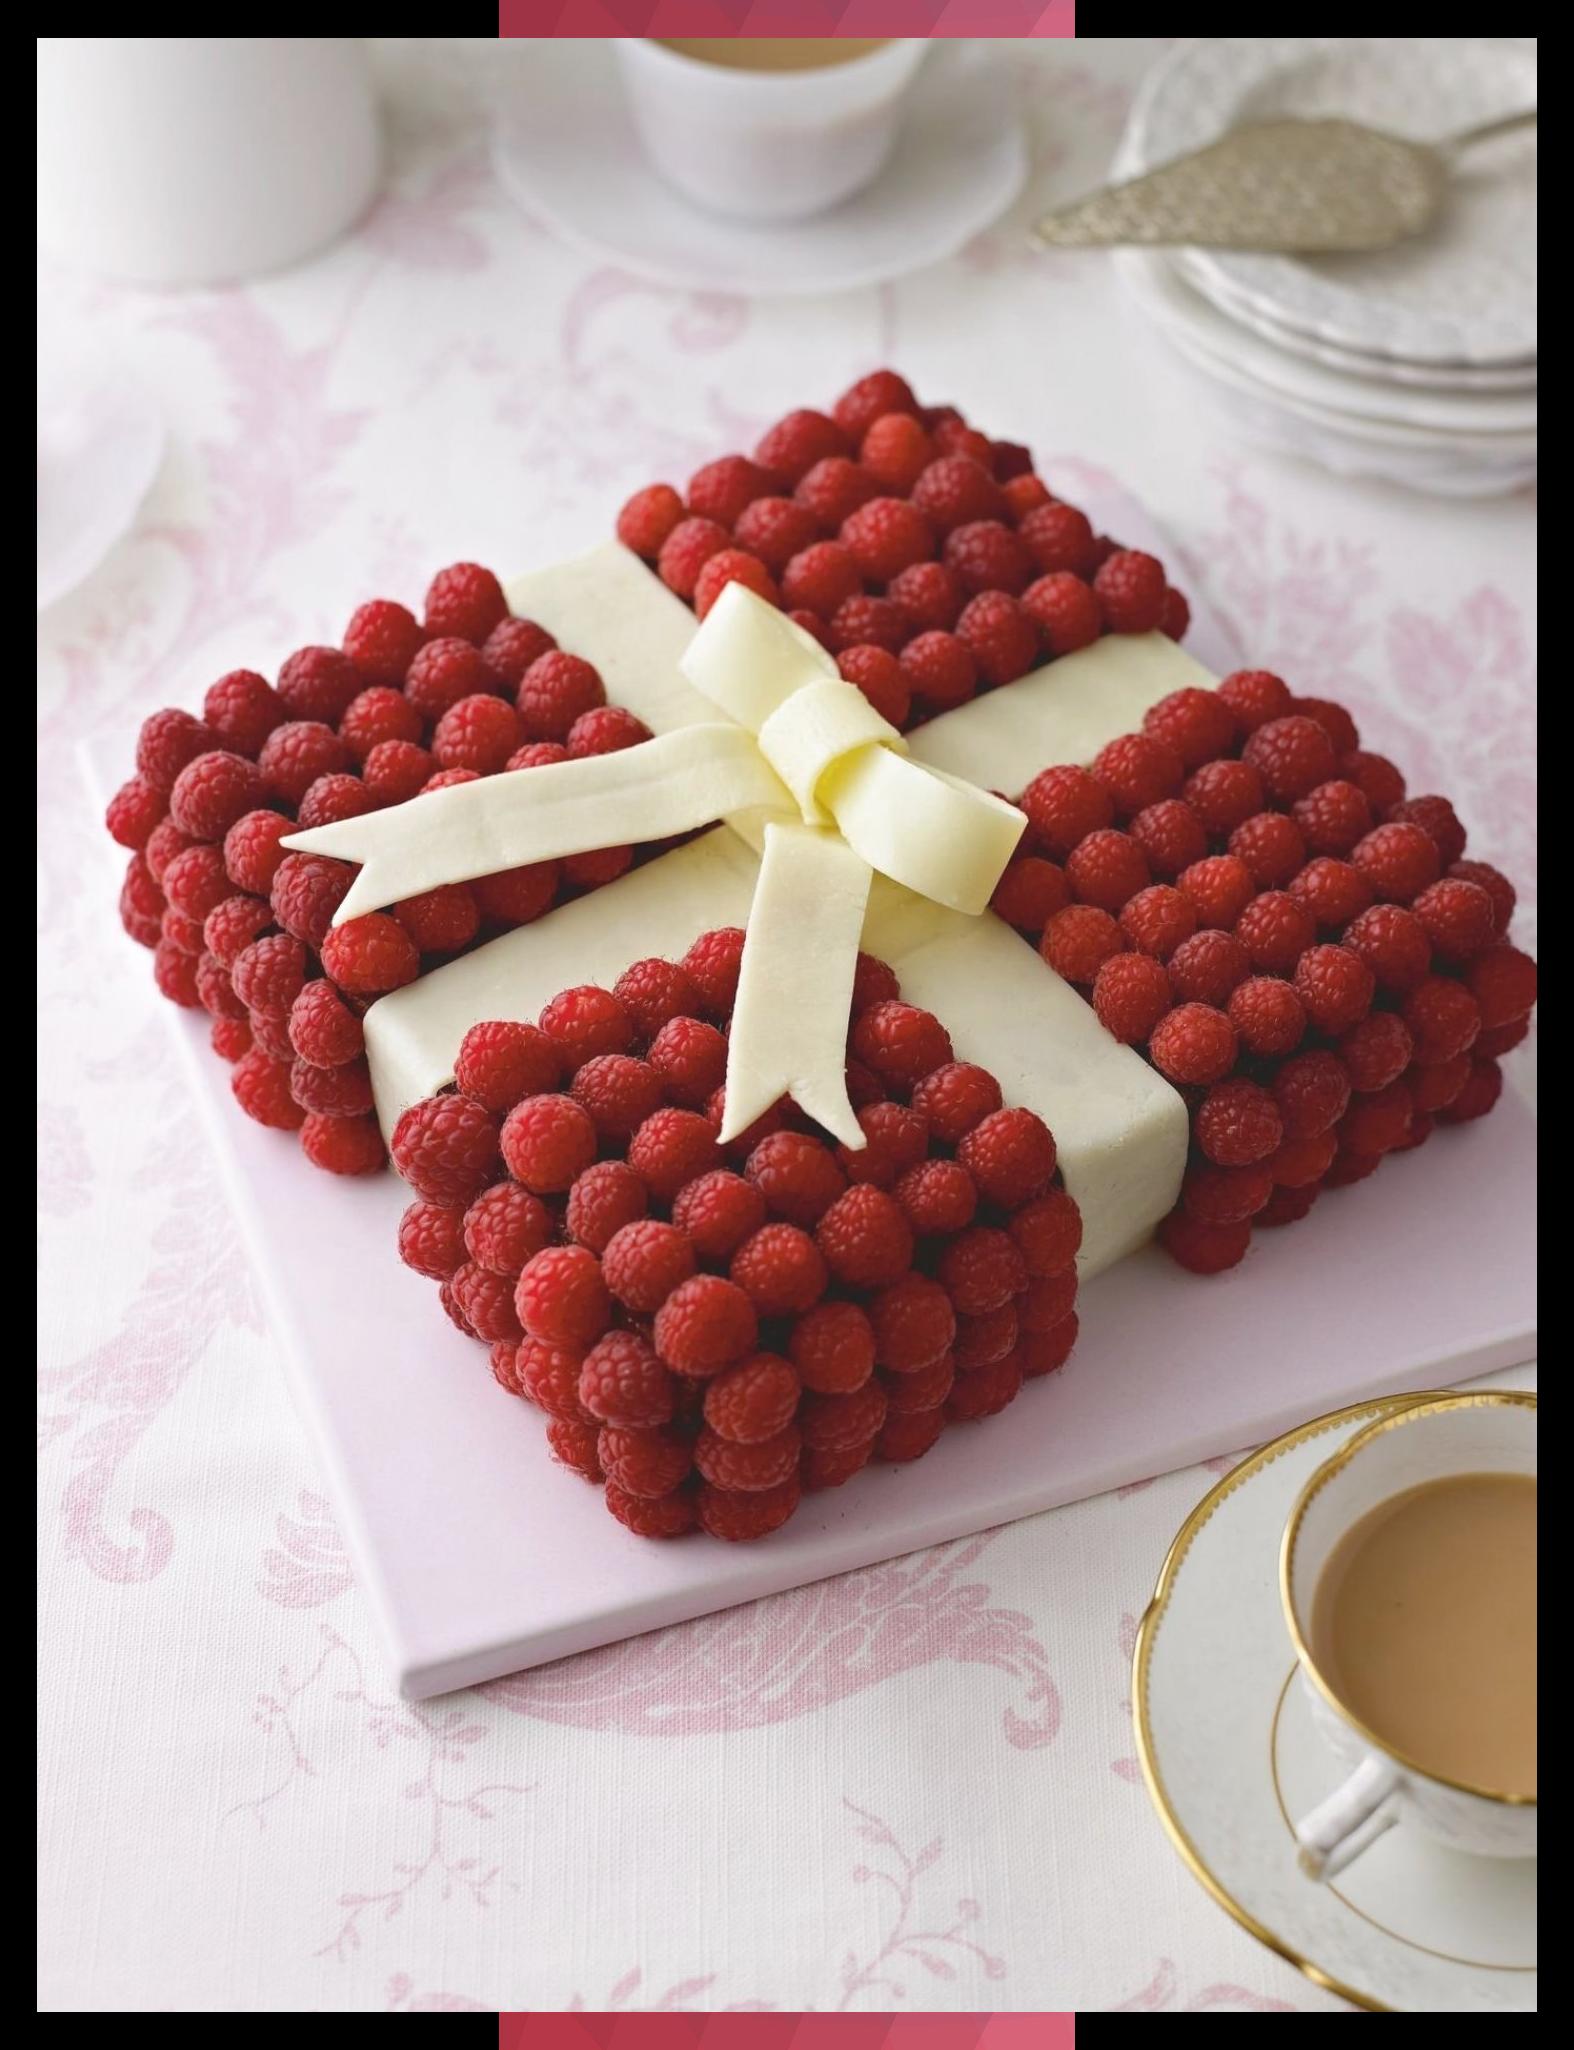 Jewel Box Cake - The Happy Foodie #Box #Cake #Foodie #Happy #jewel